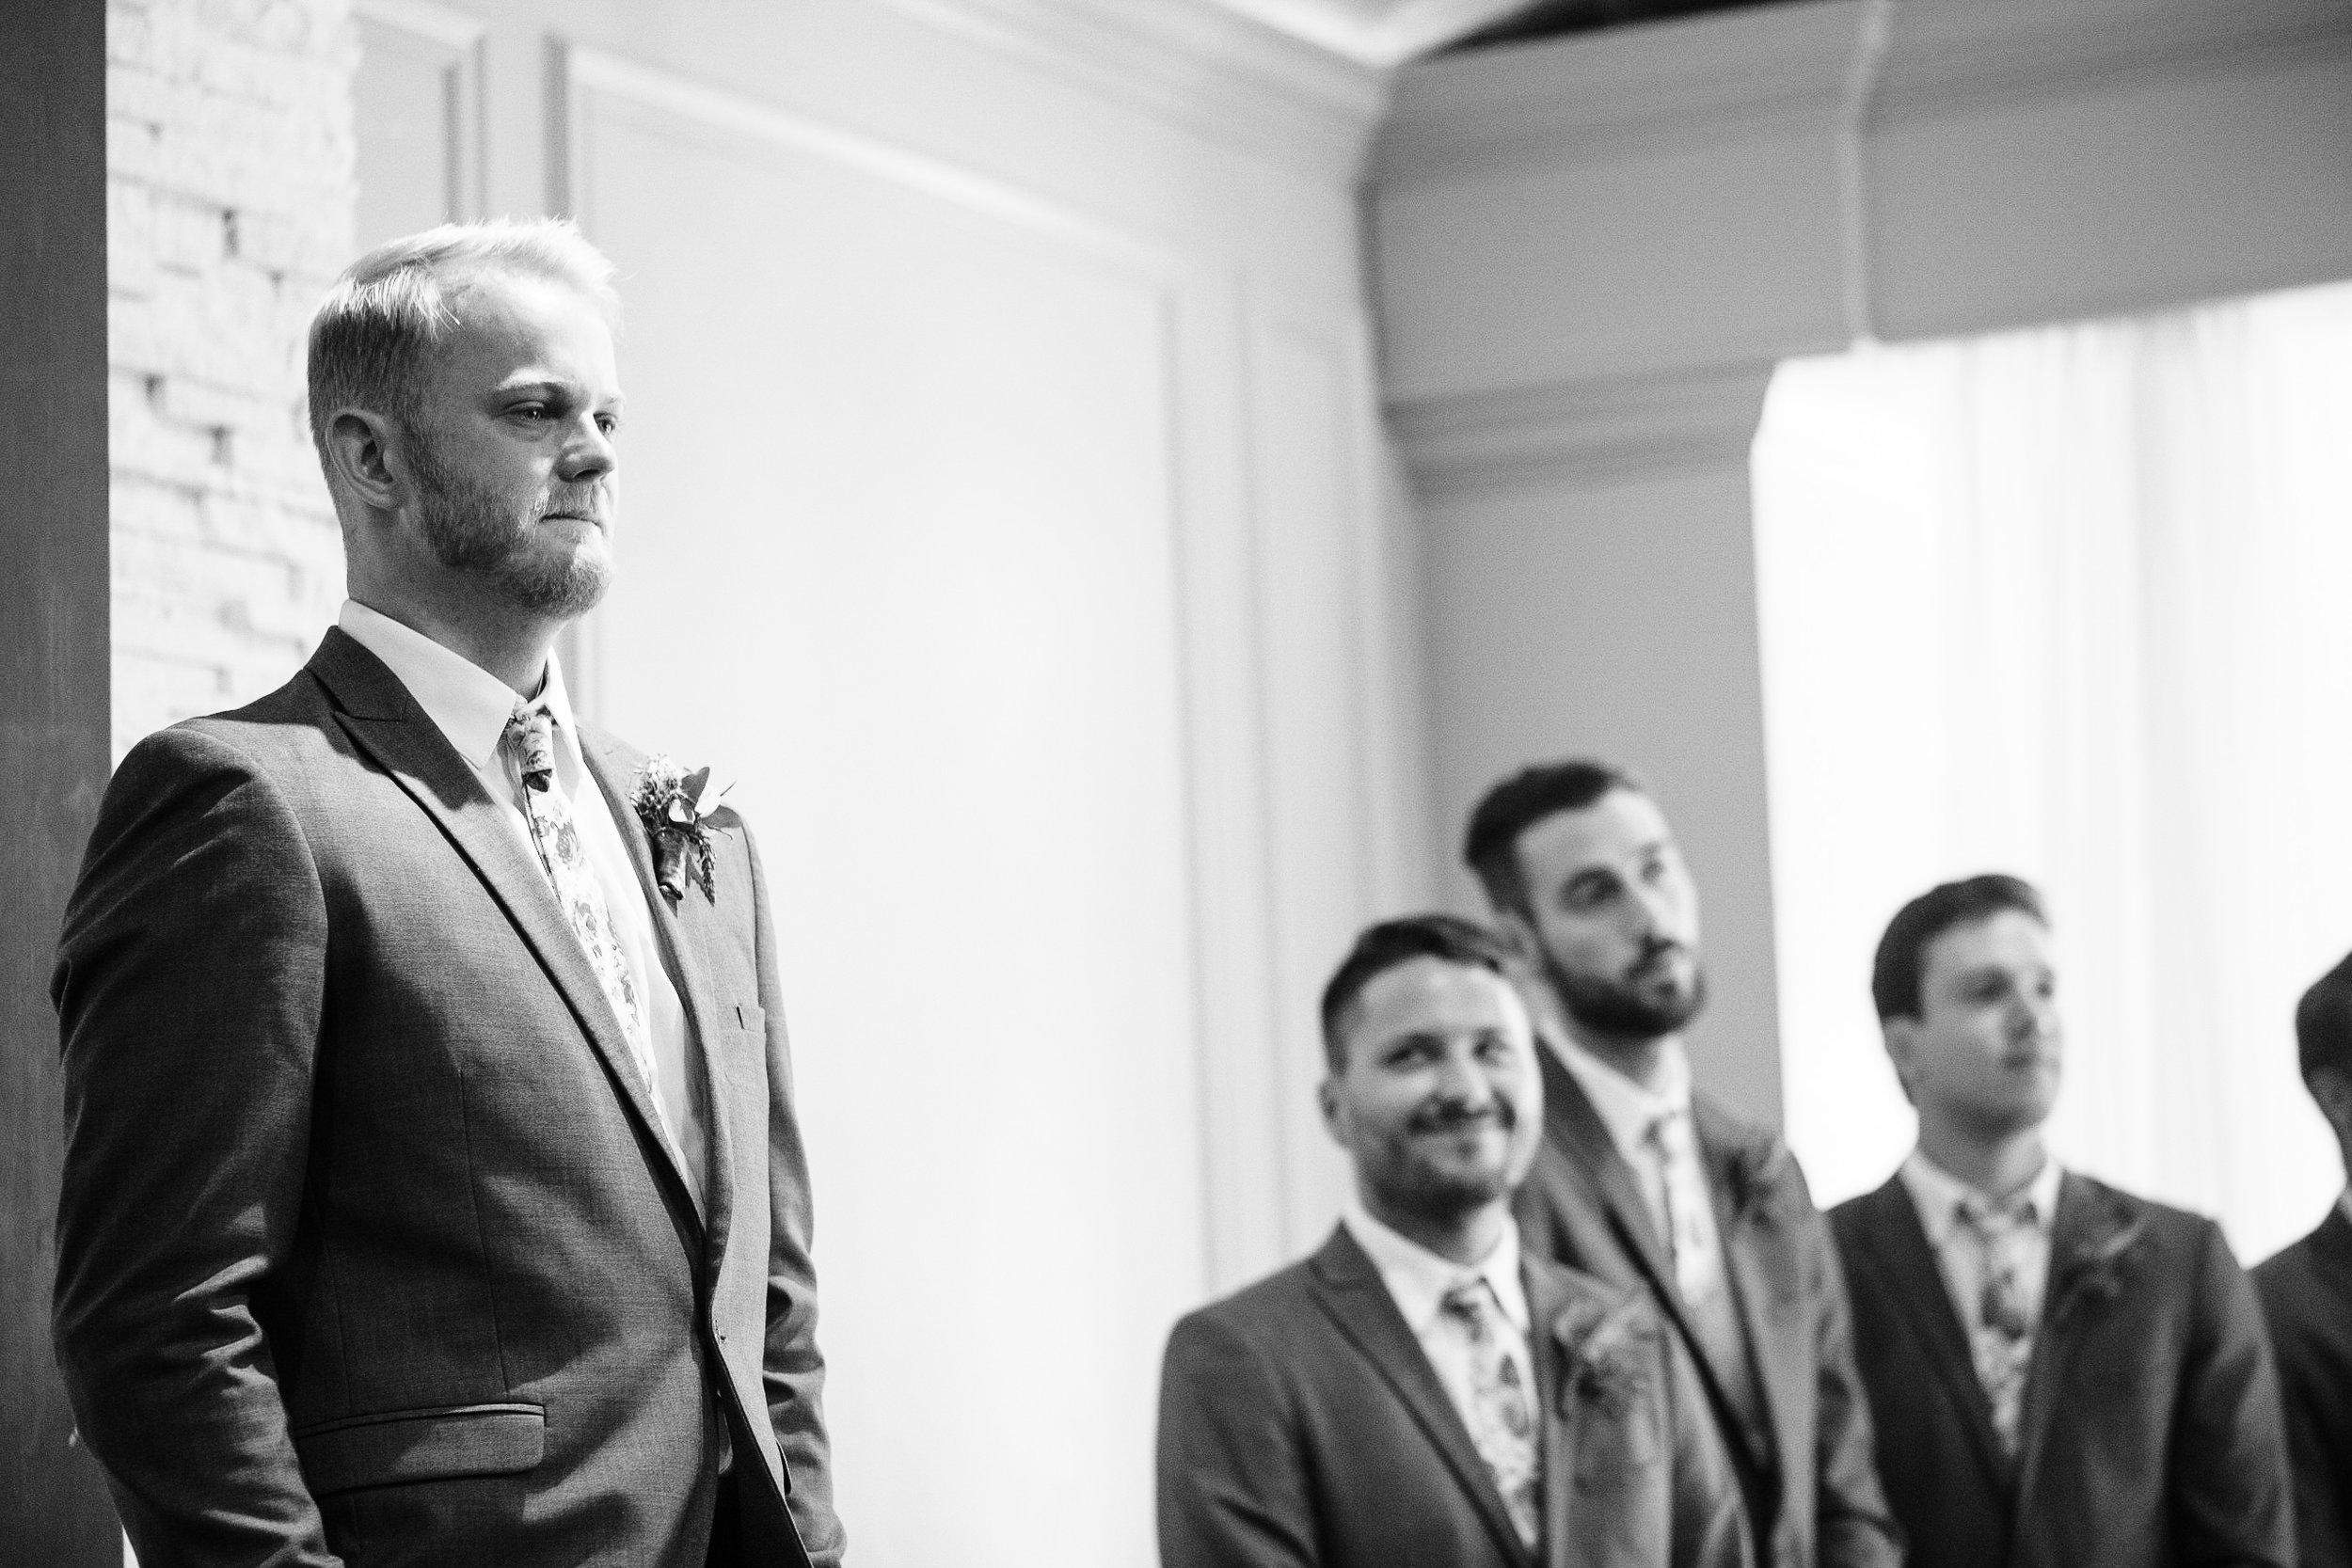 okc-wedding-photographer-coles-garden-wedding-okc-best-wedding-photographers-112.jpg